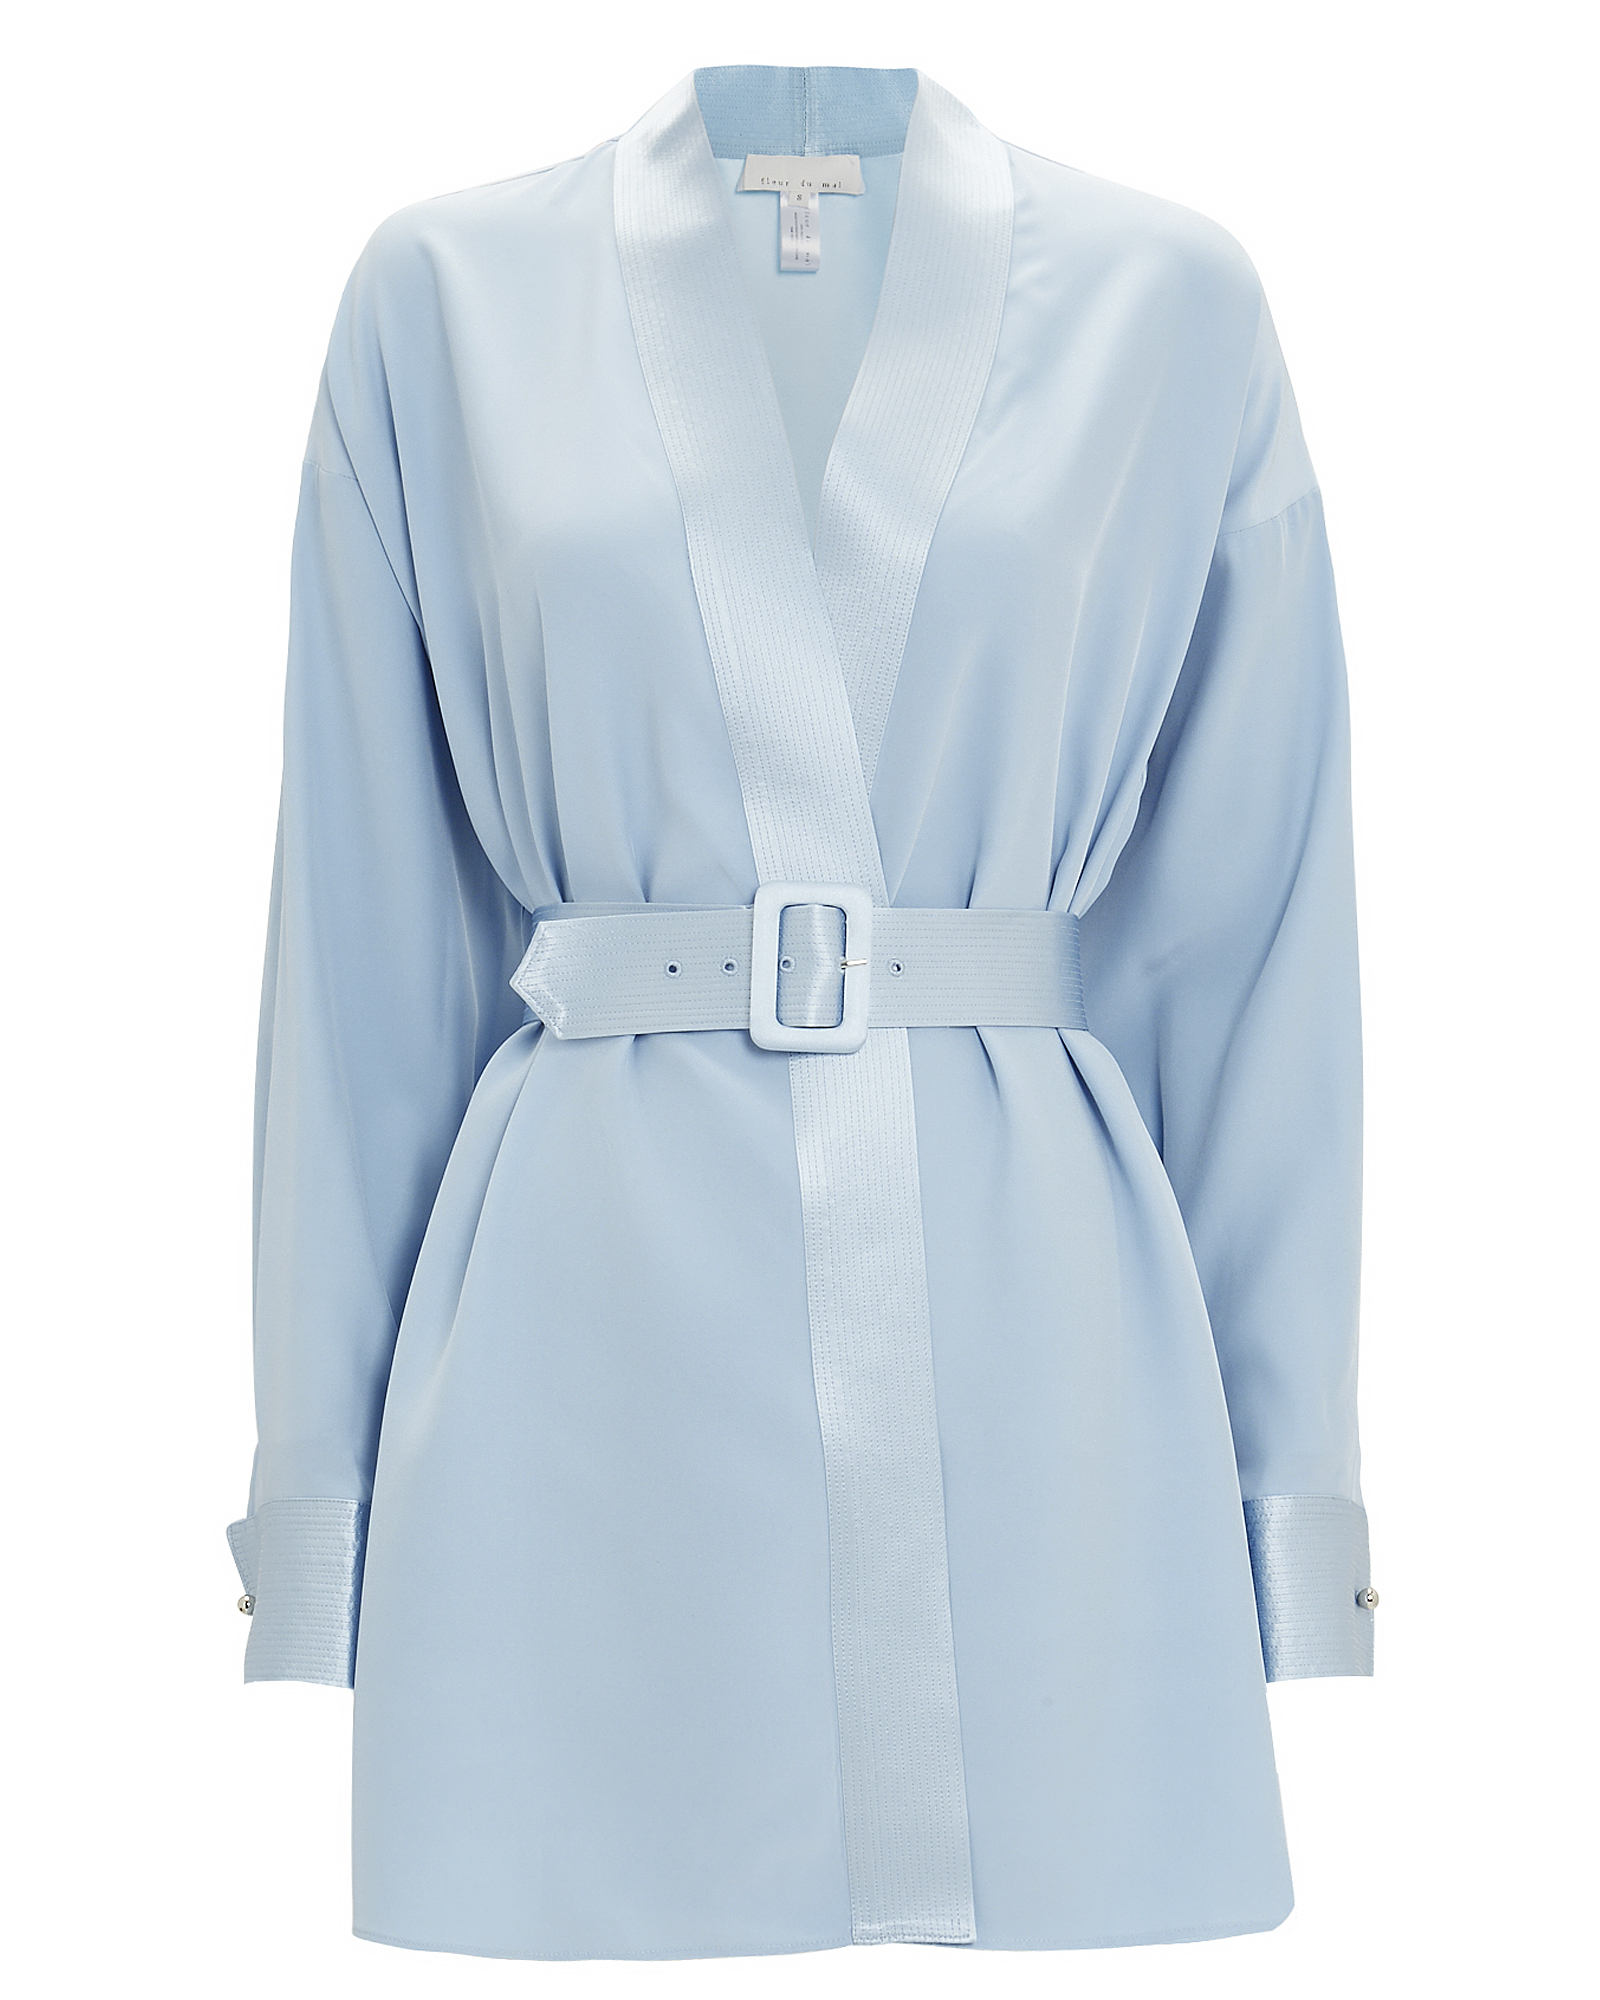 Fleur Du Mal Dresses FLEUR DU MAL CUFFLINK MINI DRESS  ICE BLUE L